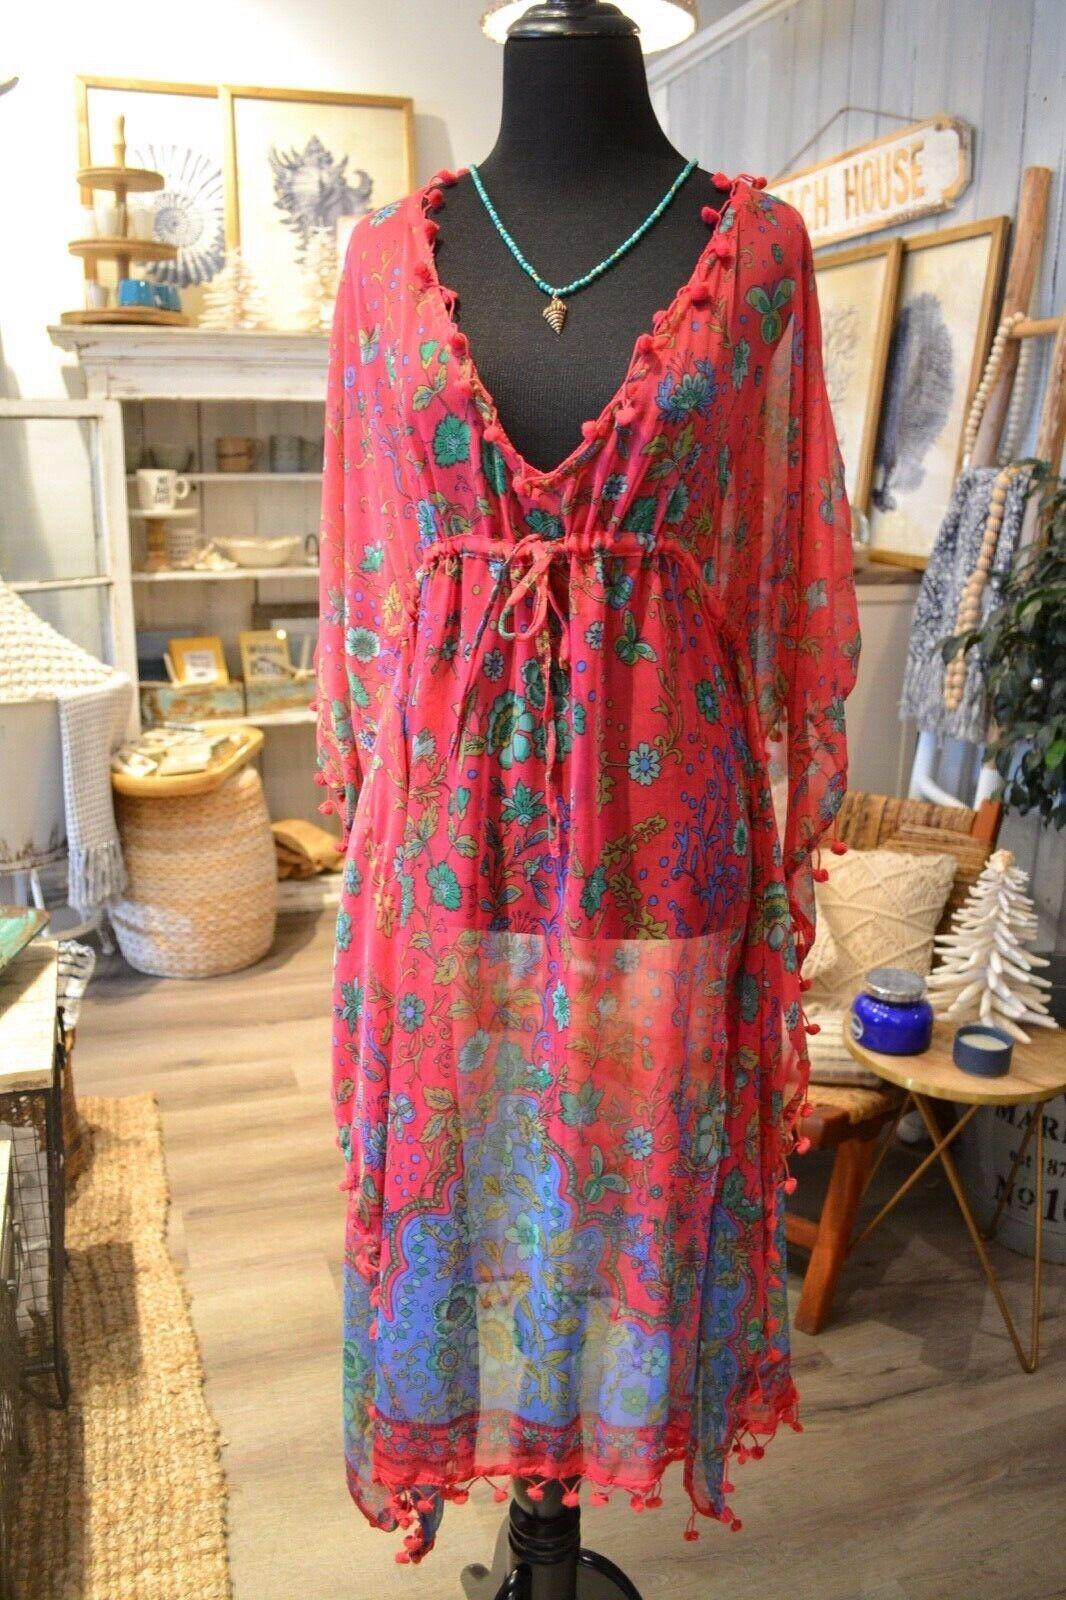 Raj sheer silk fuchsia floral cover up dress one size